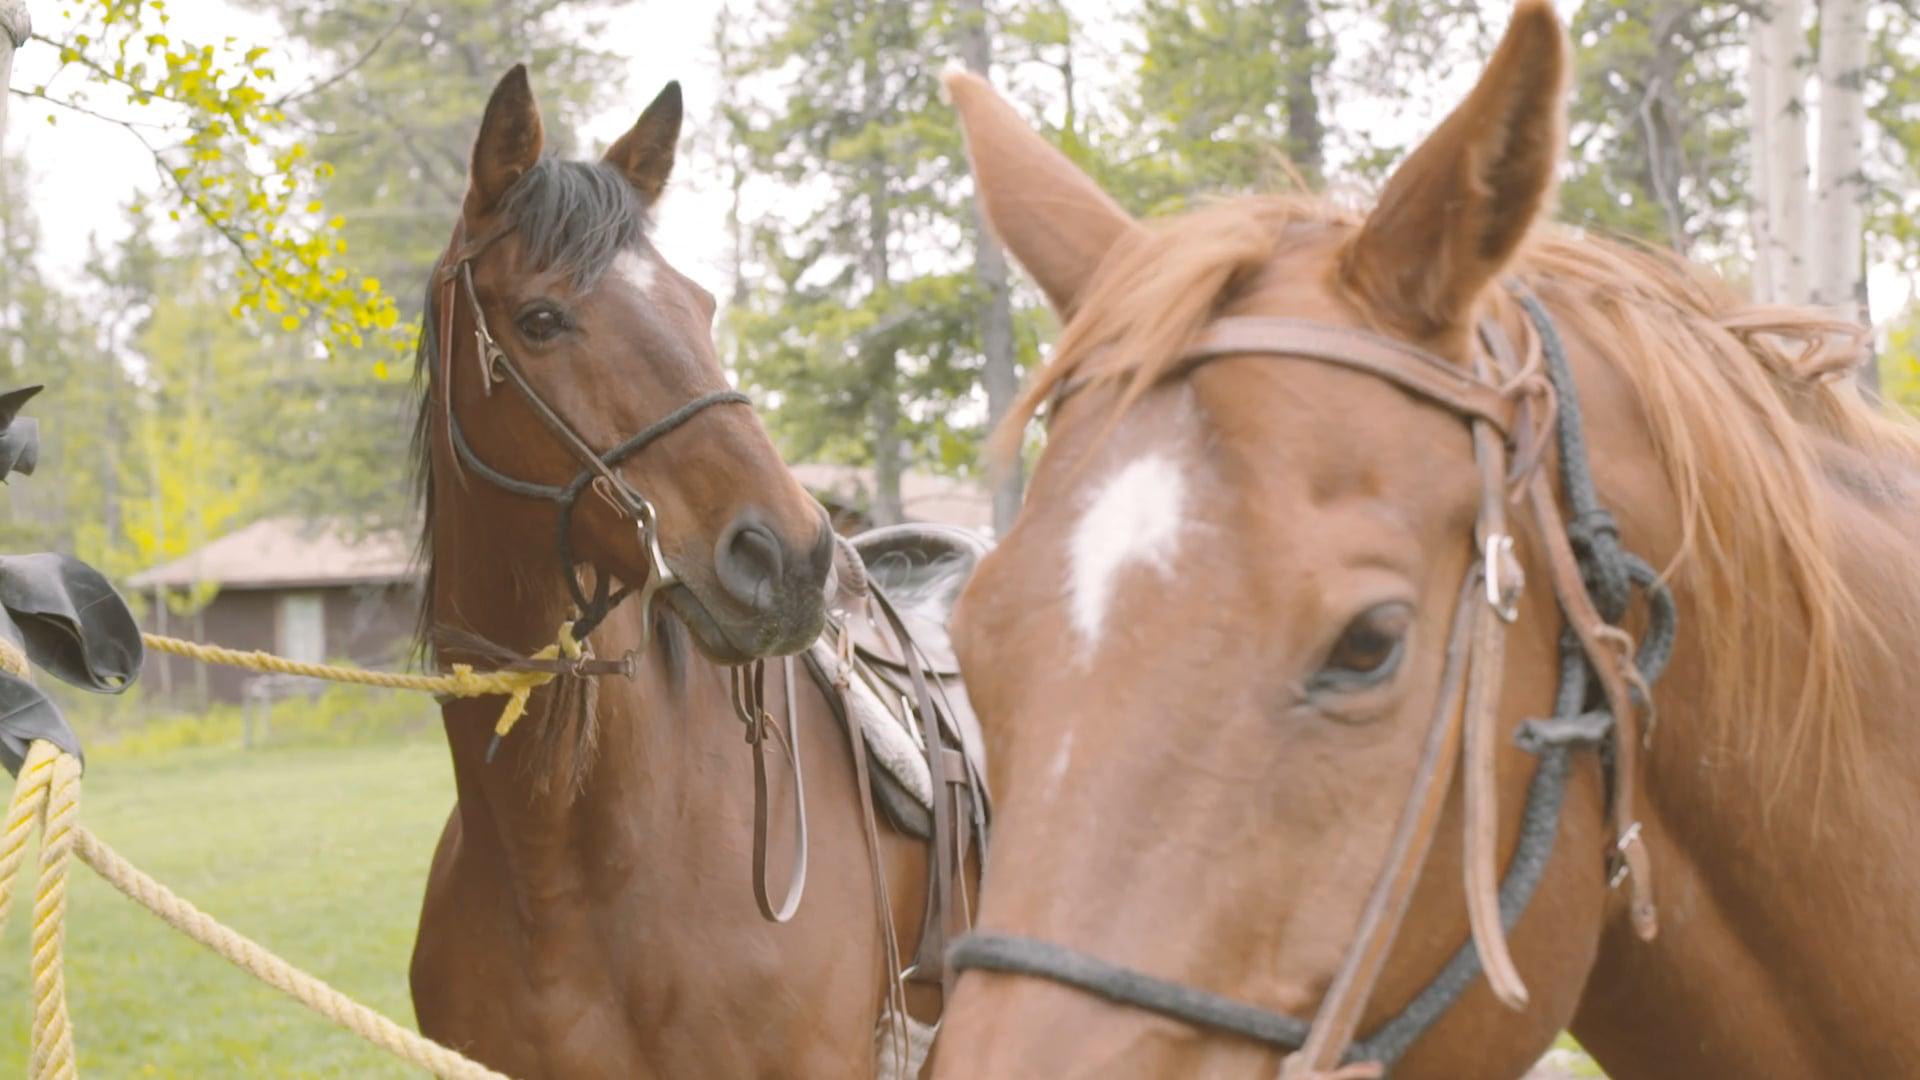 Evolve Retreat Co. - HORSE BACK RIDING